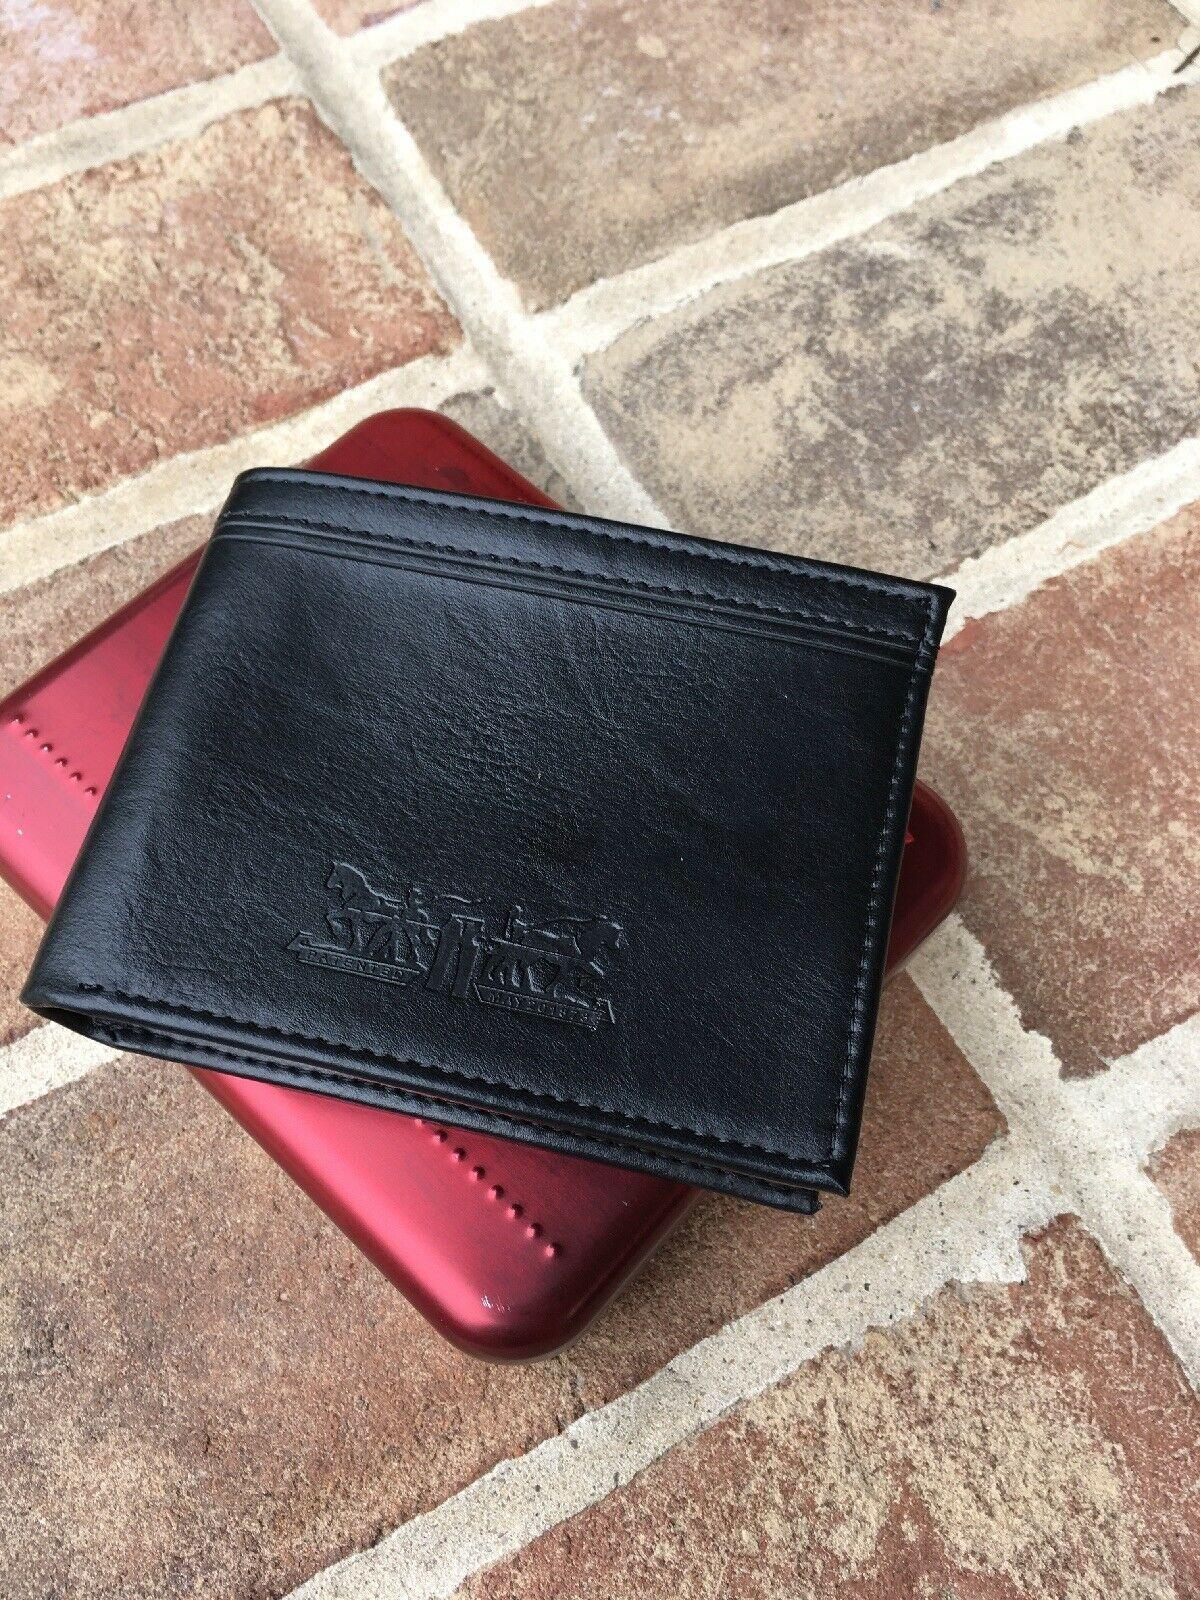 Levi's Men's Black Bifold Leather Wallet RFID Blocking